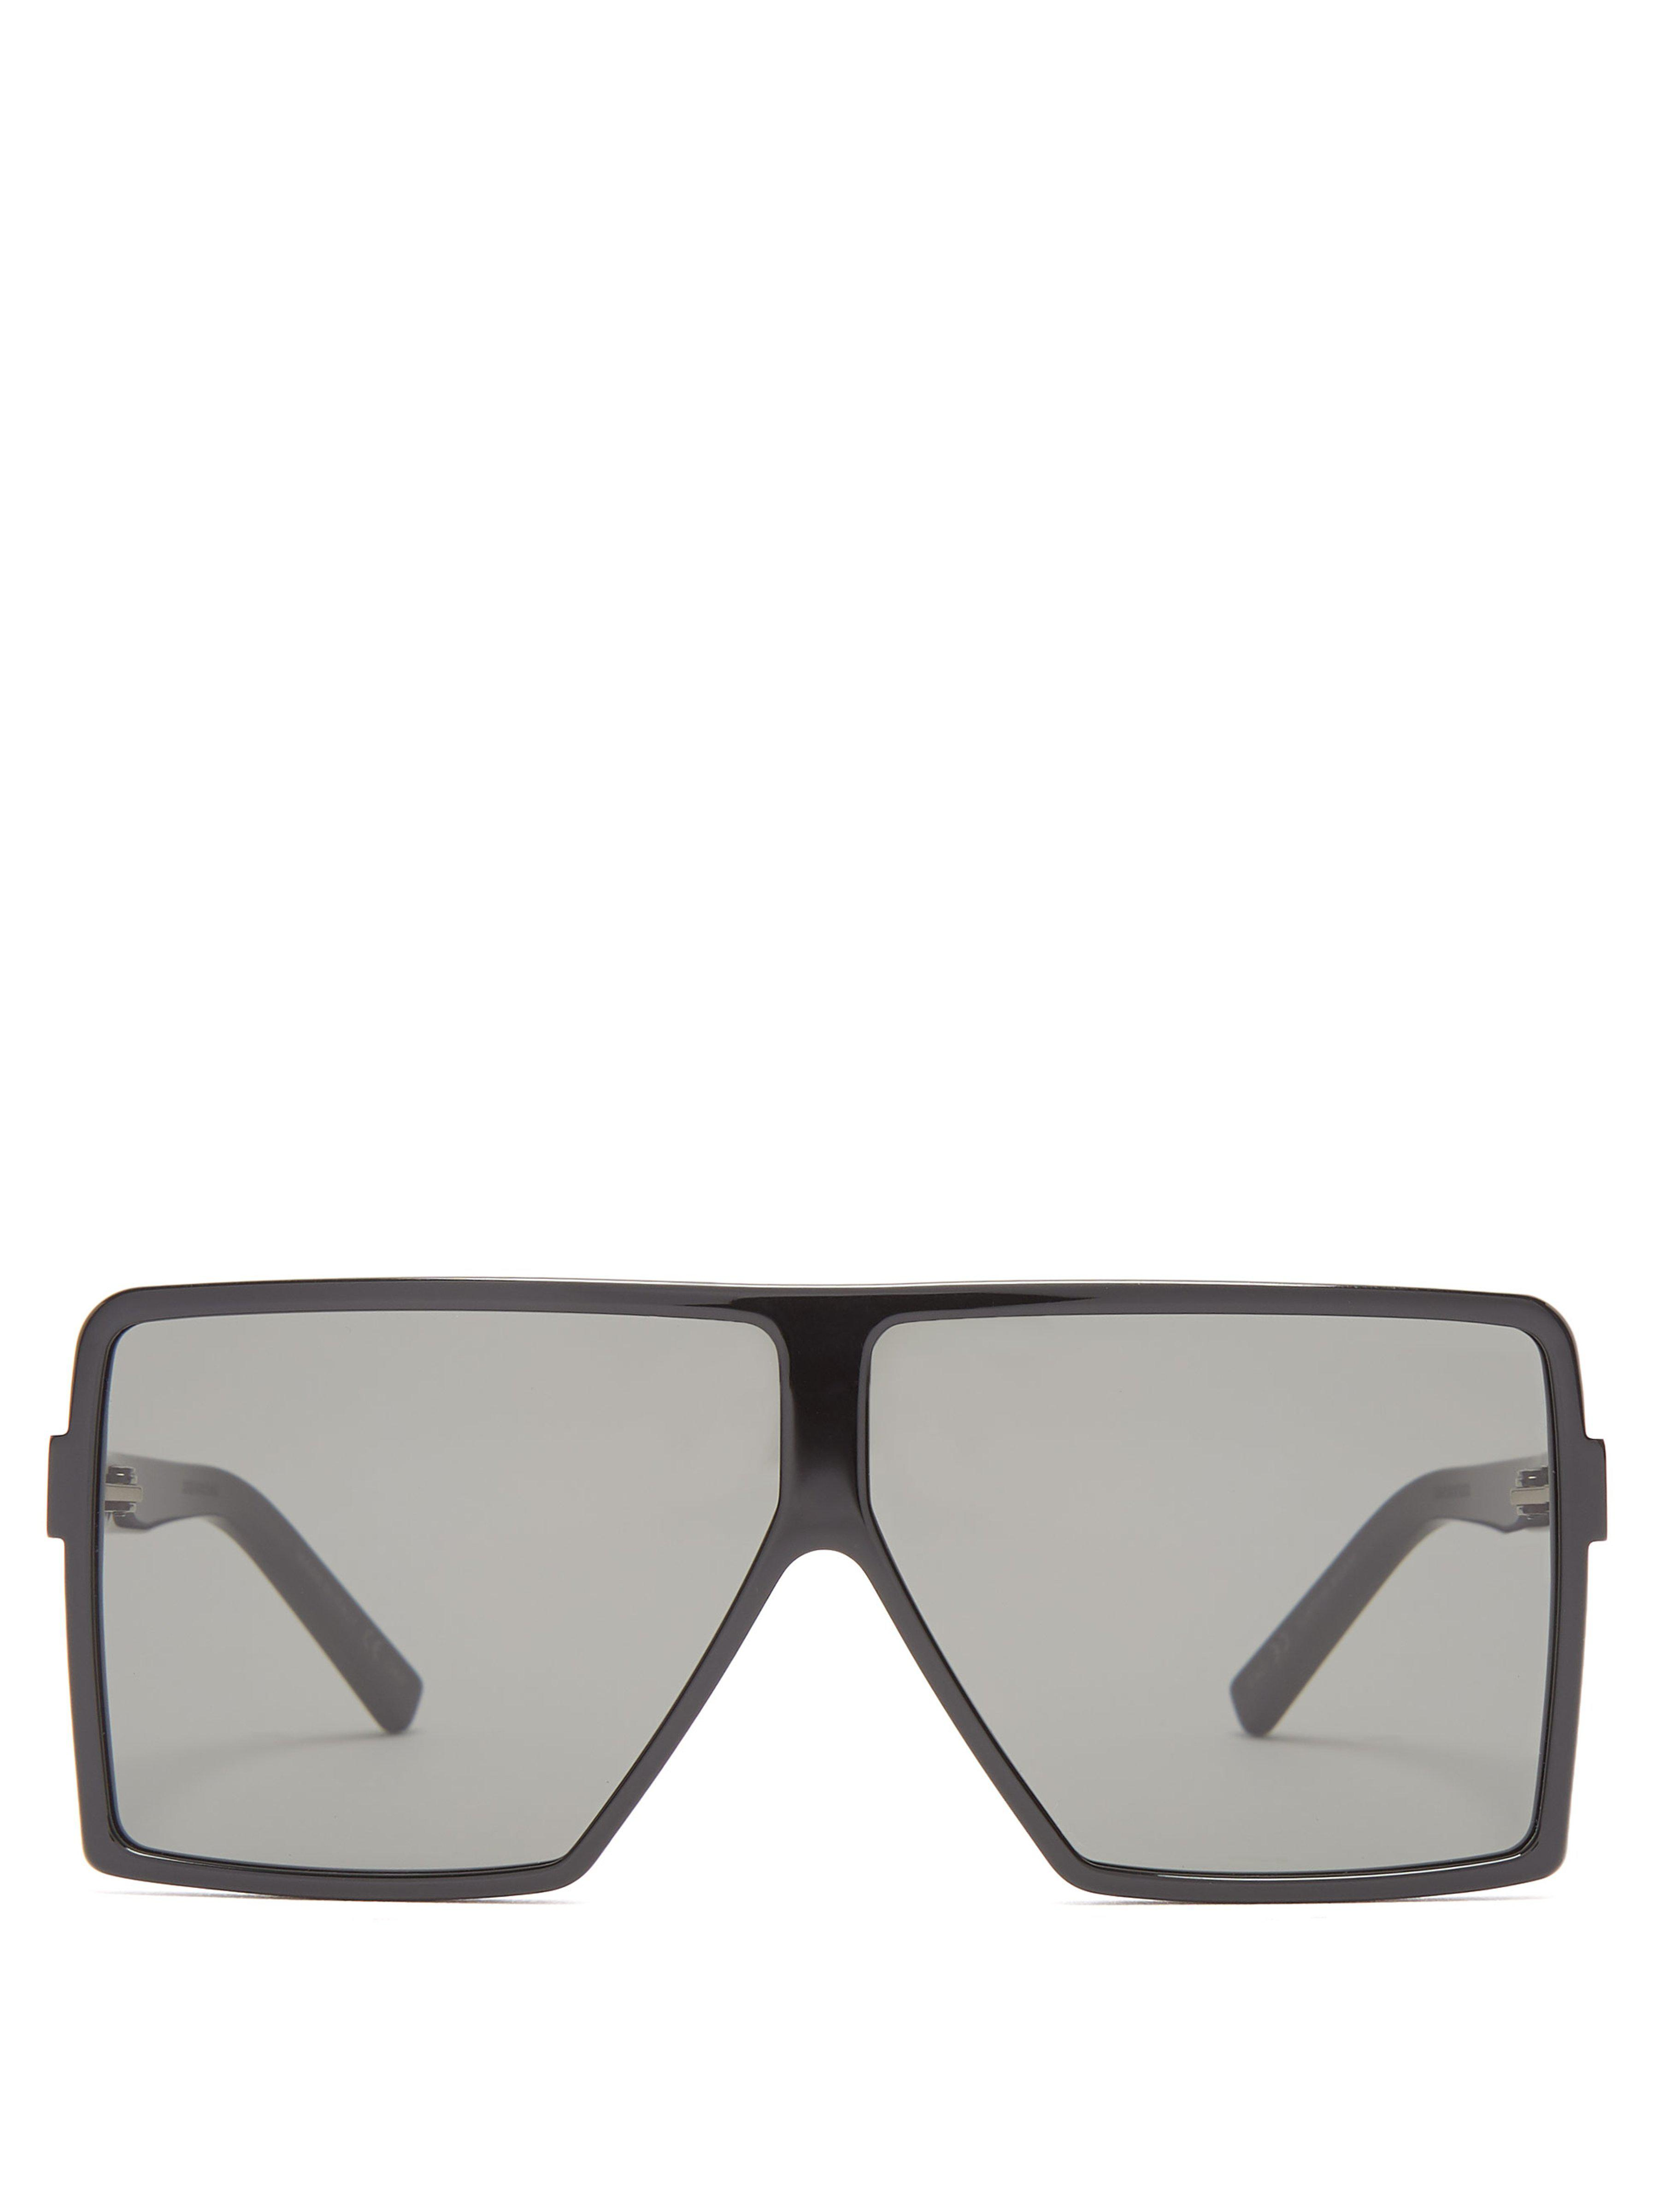 04a3ff5e3428 Saint Laurent Betty Flat Top Acetate Sunglasses in Black - Lyst